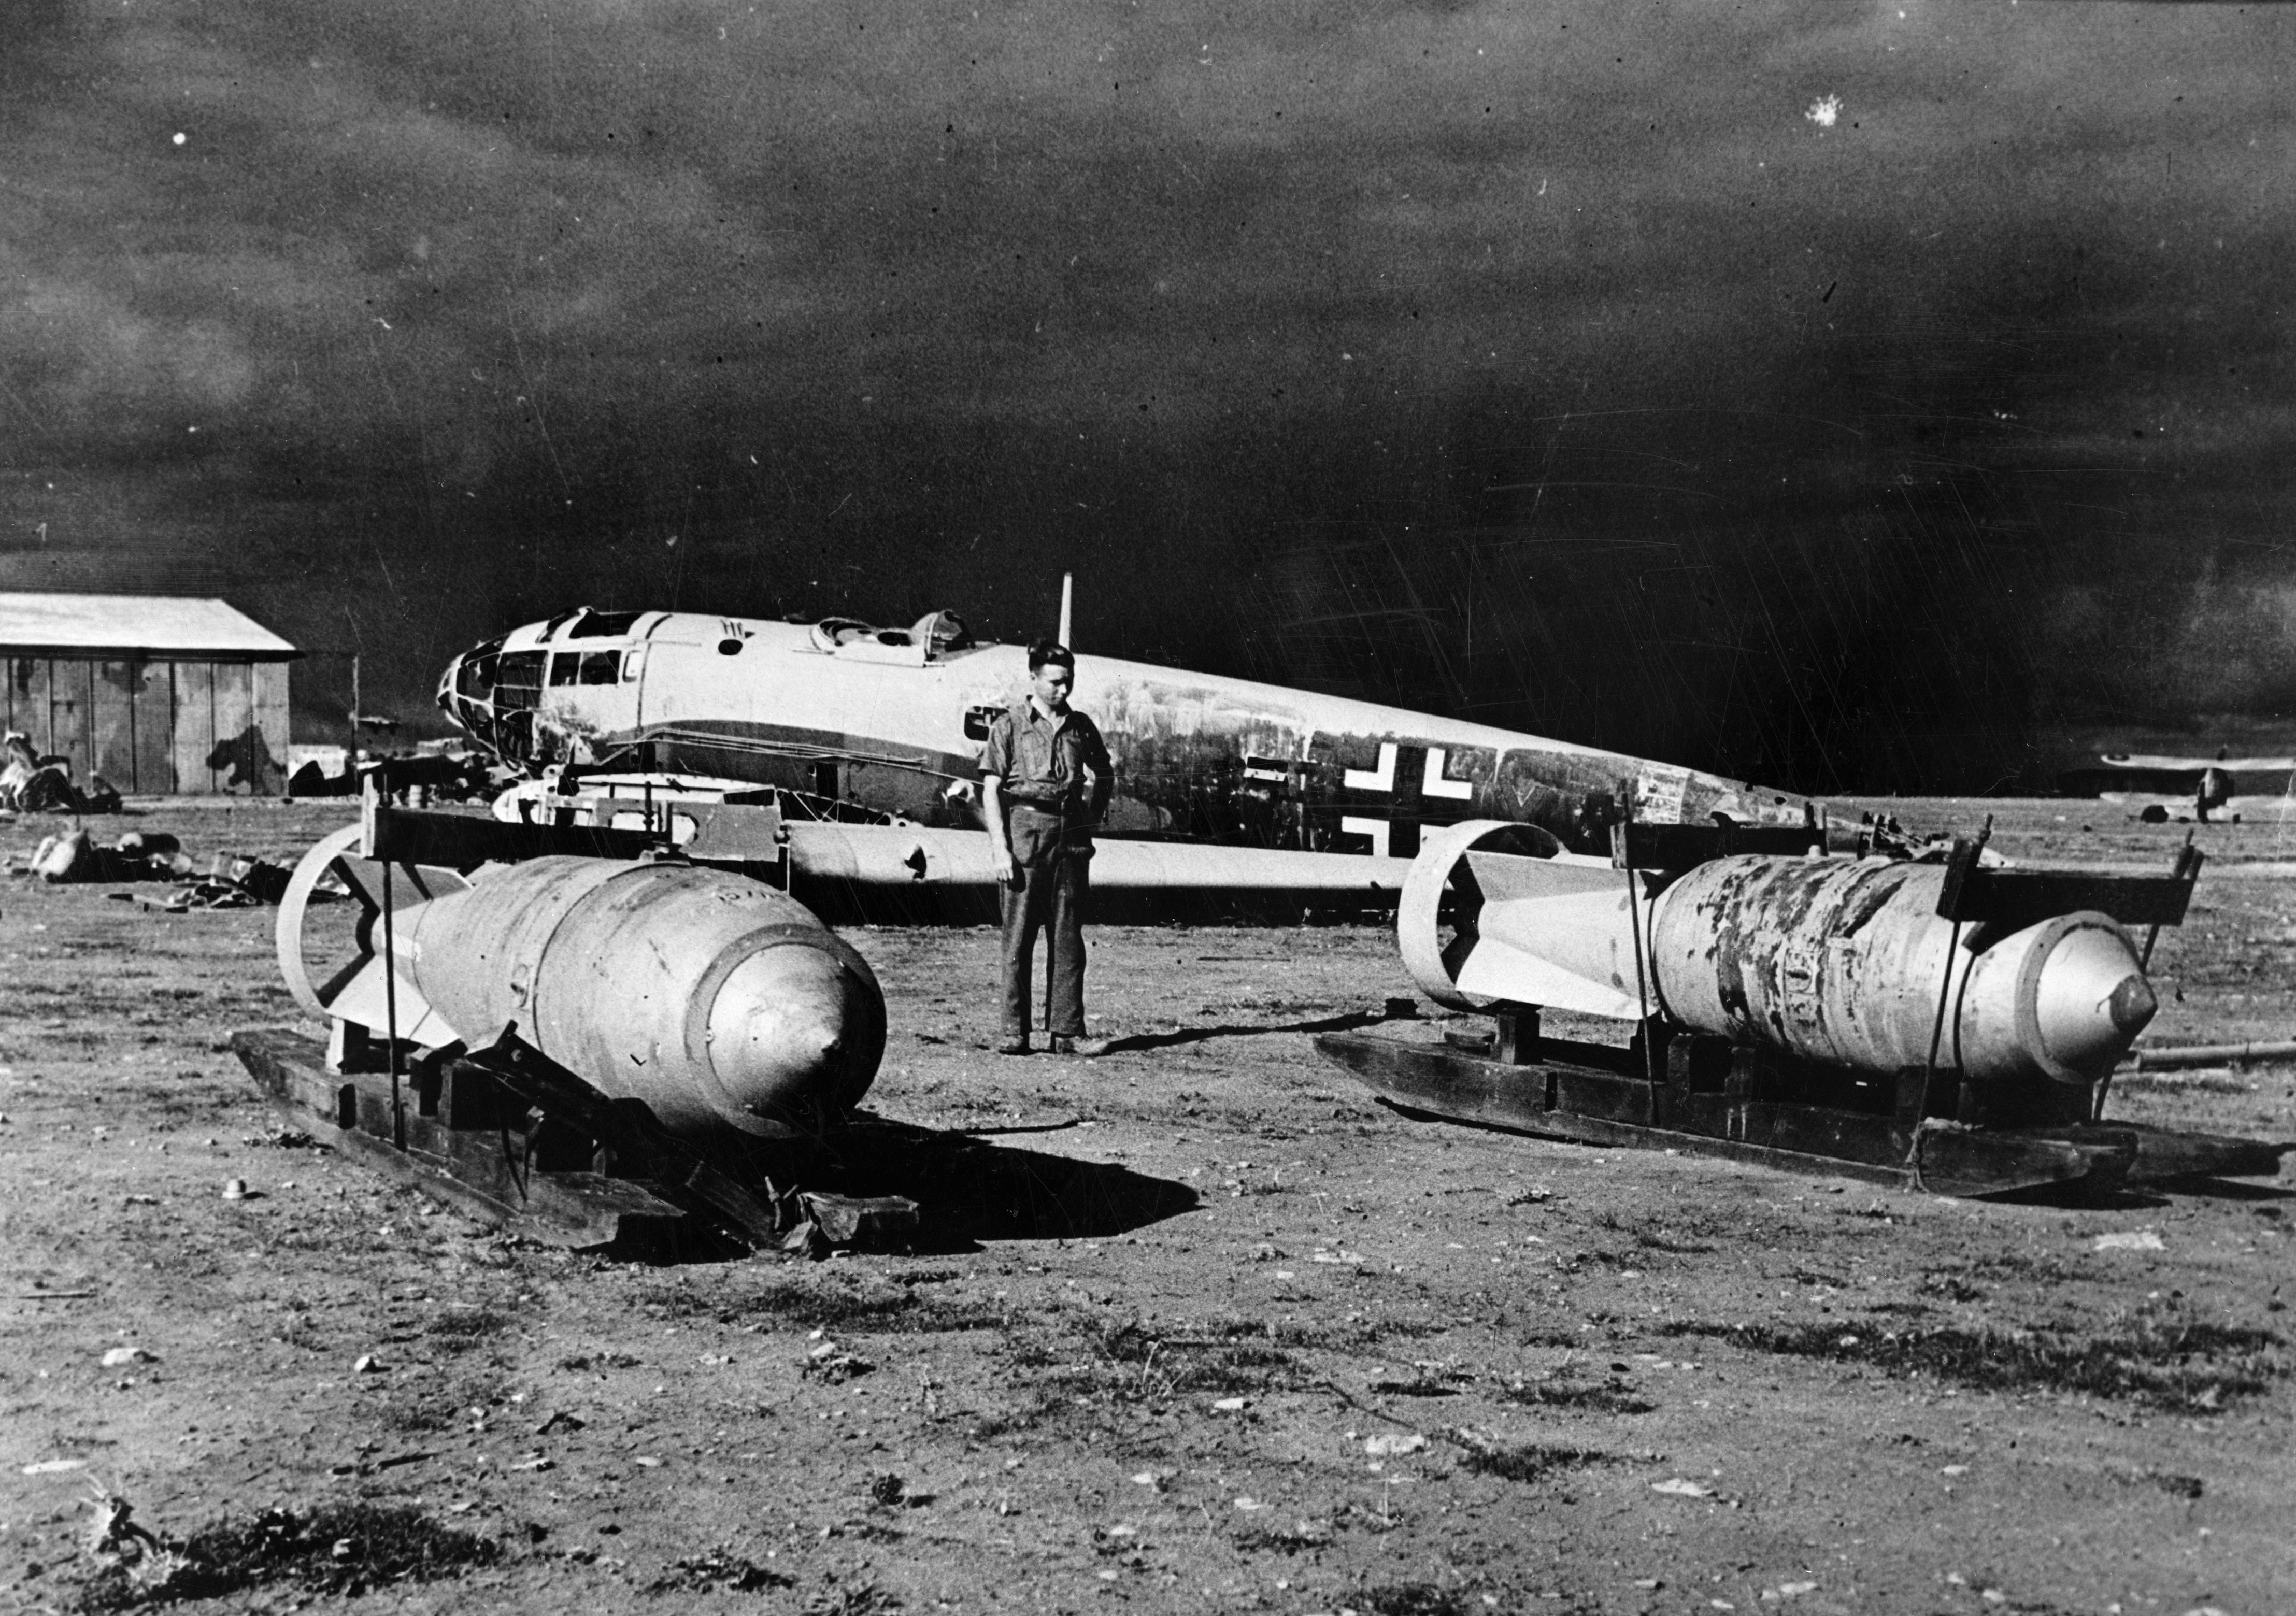 Abandoned German airfield, Benghazi 1943